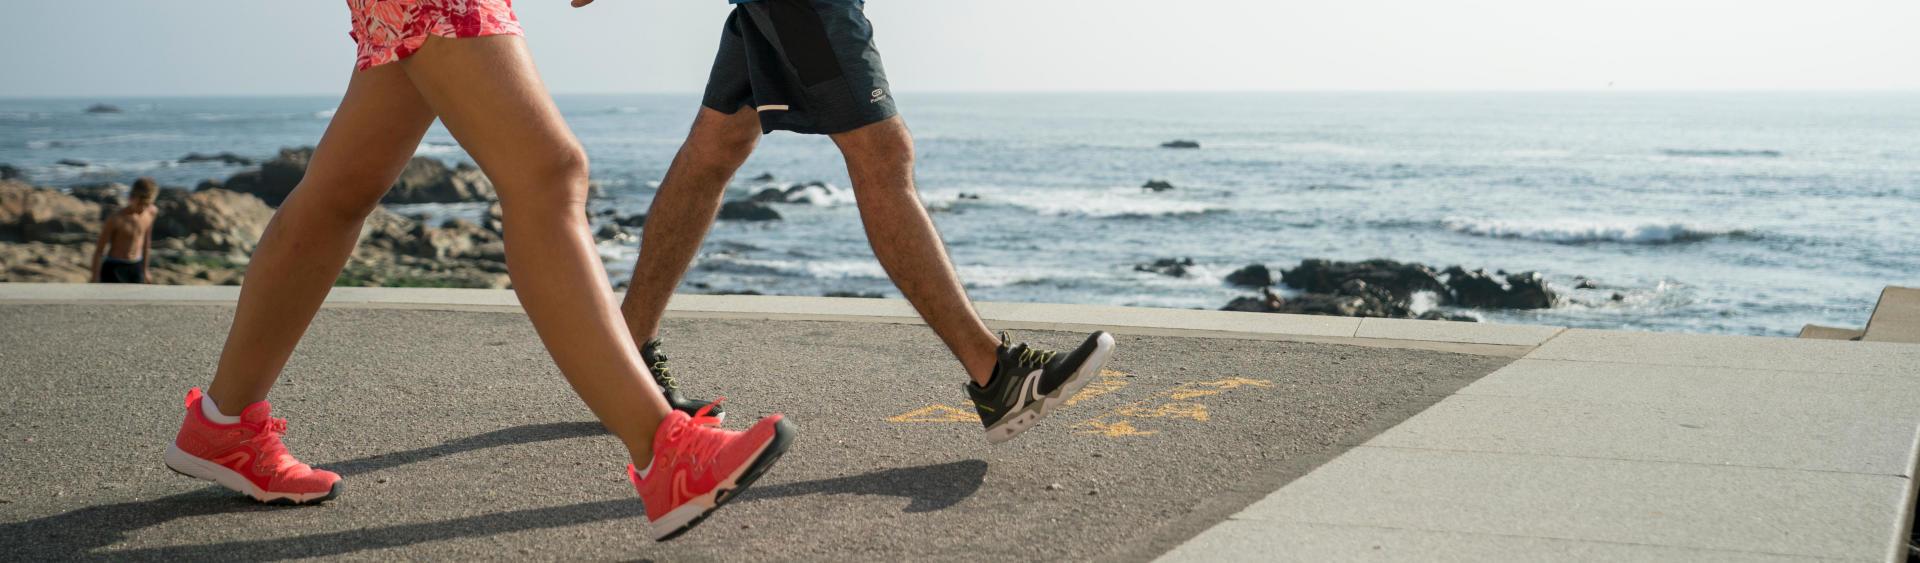 choisir-chaussures-marche-sportive